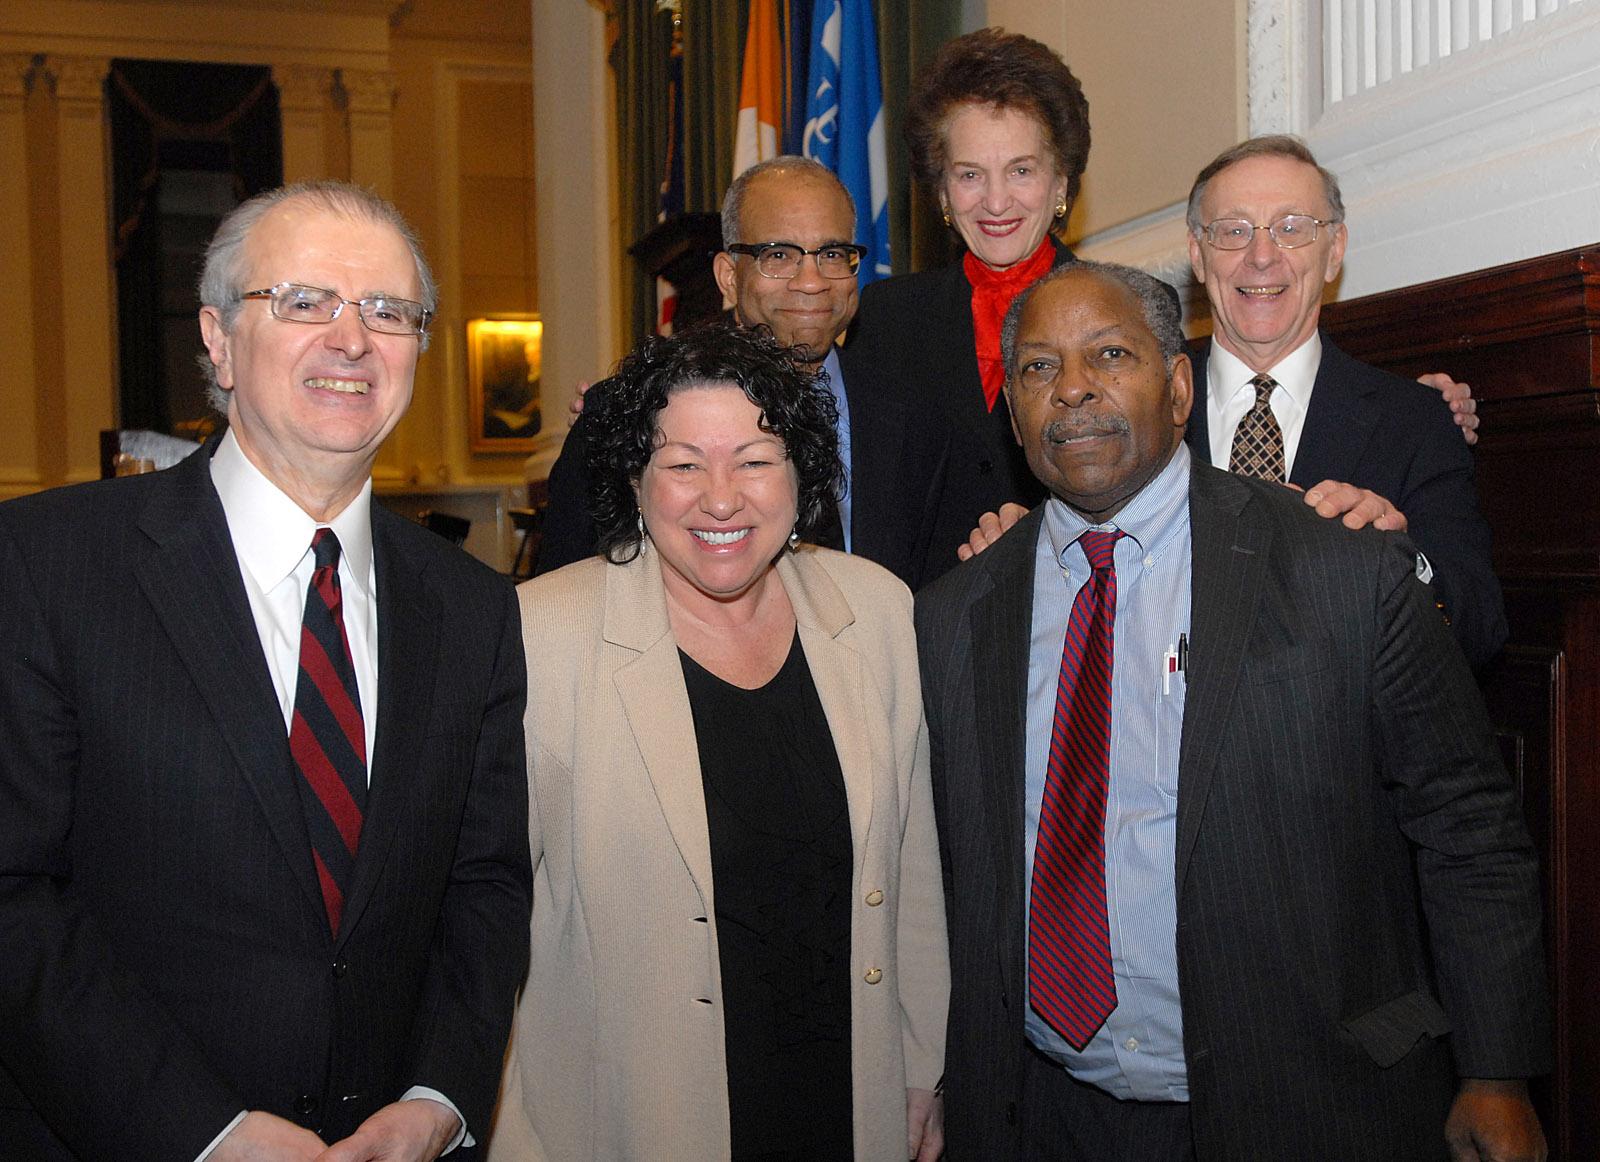 Front (L-R): Hon. Jonathan Lippman, Hon. Sonia M. Sotomayor, Hon. George Bundy Smith; Back (L-R): Randall L. Kennedy, Hon. Judith S. Kaye, Hon. Albert M. Rosenblatt